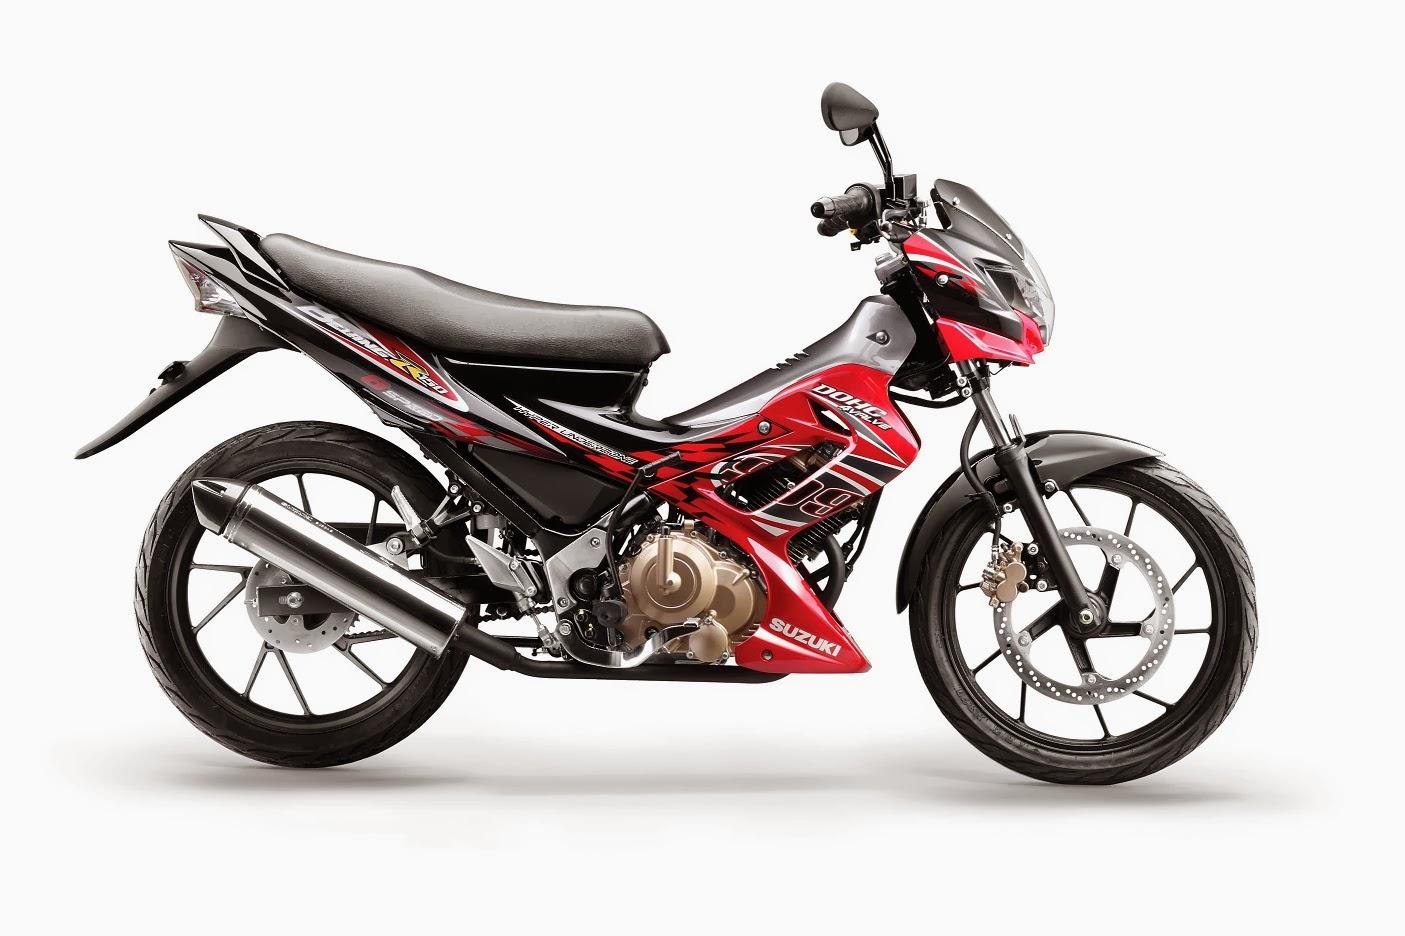 Satria Fu 150cc Vs New Honda Sonic 125cc - Variasi Motor